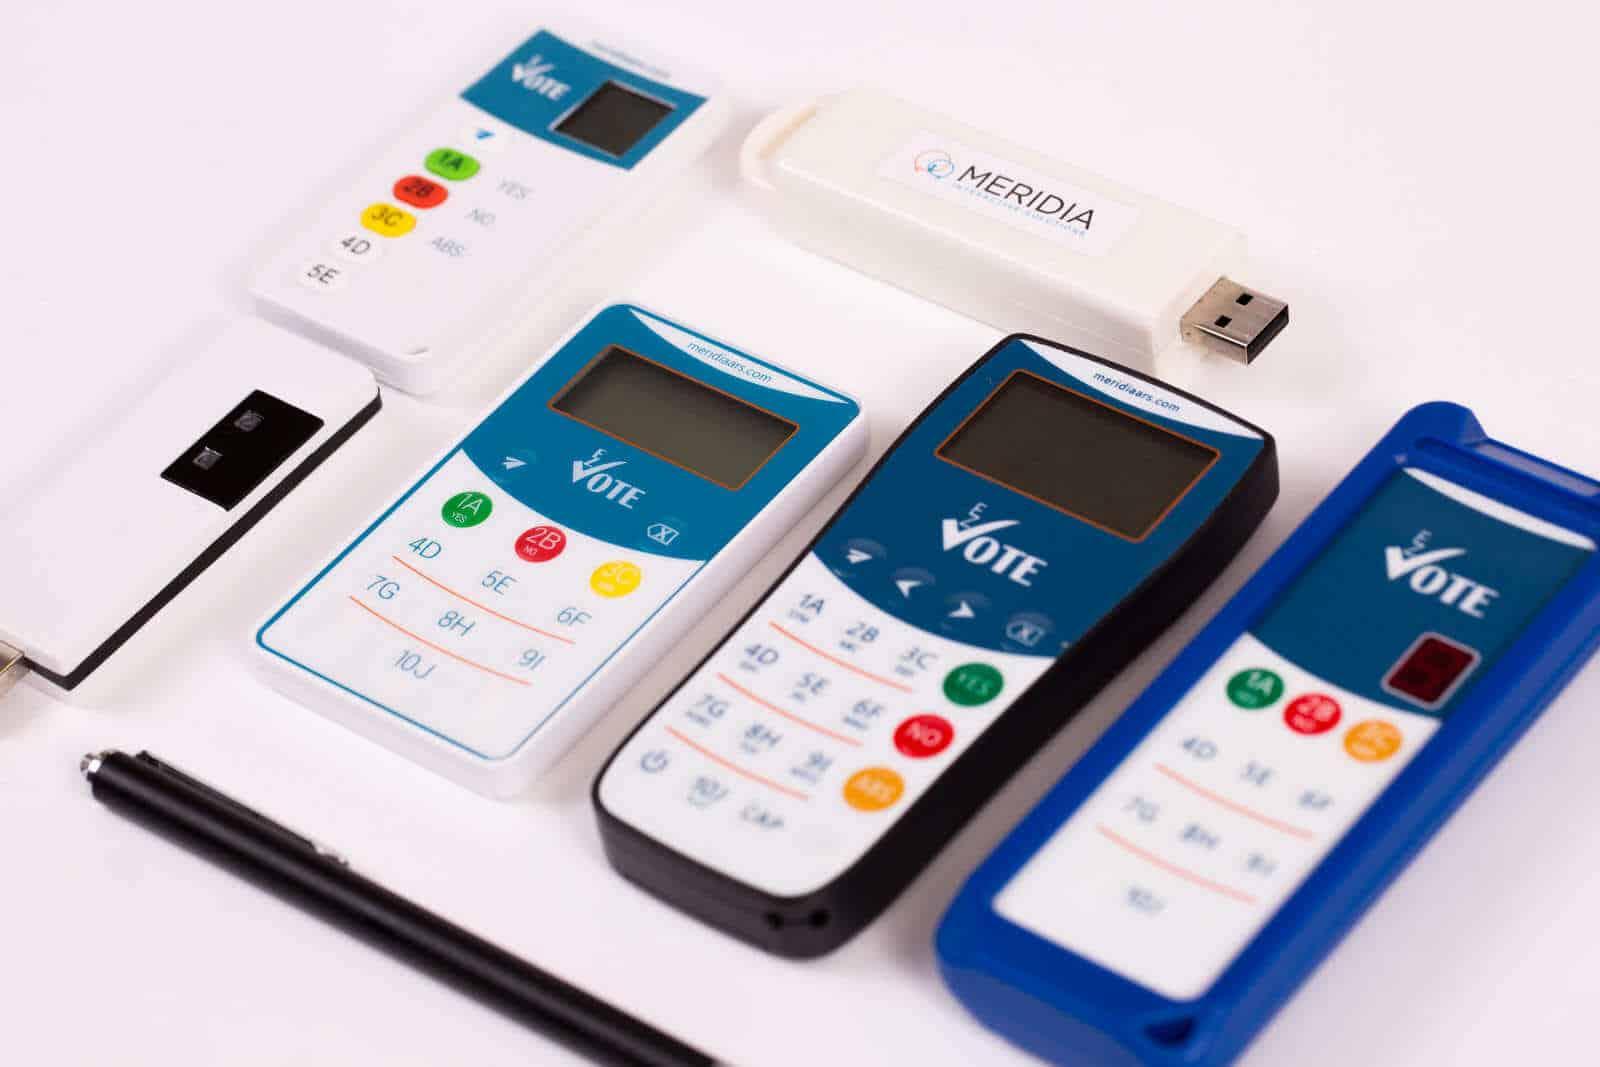 Electronic Voting Keypads